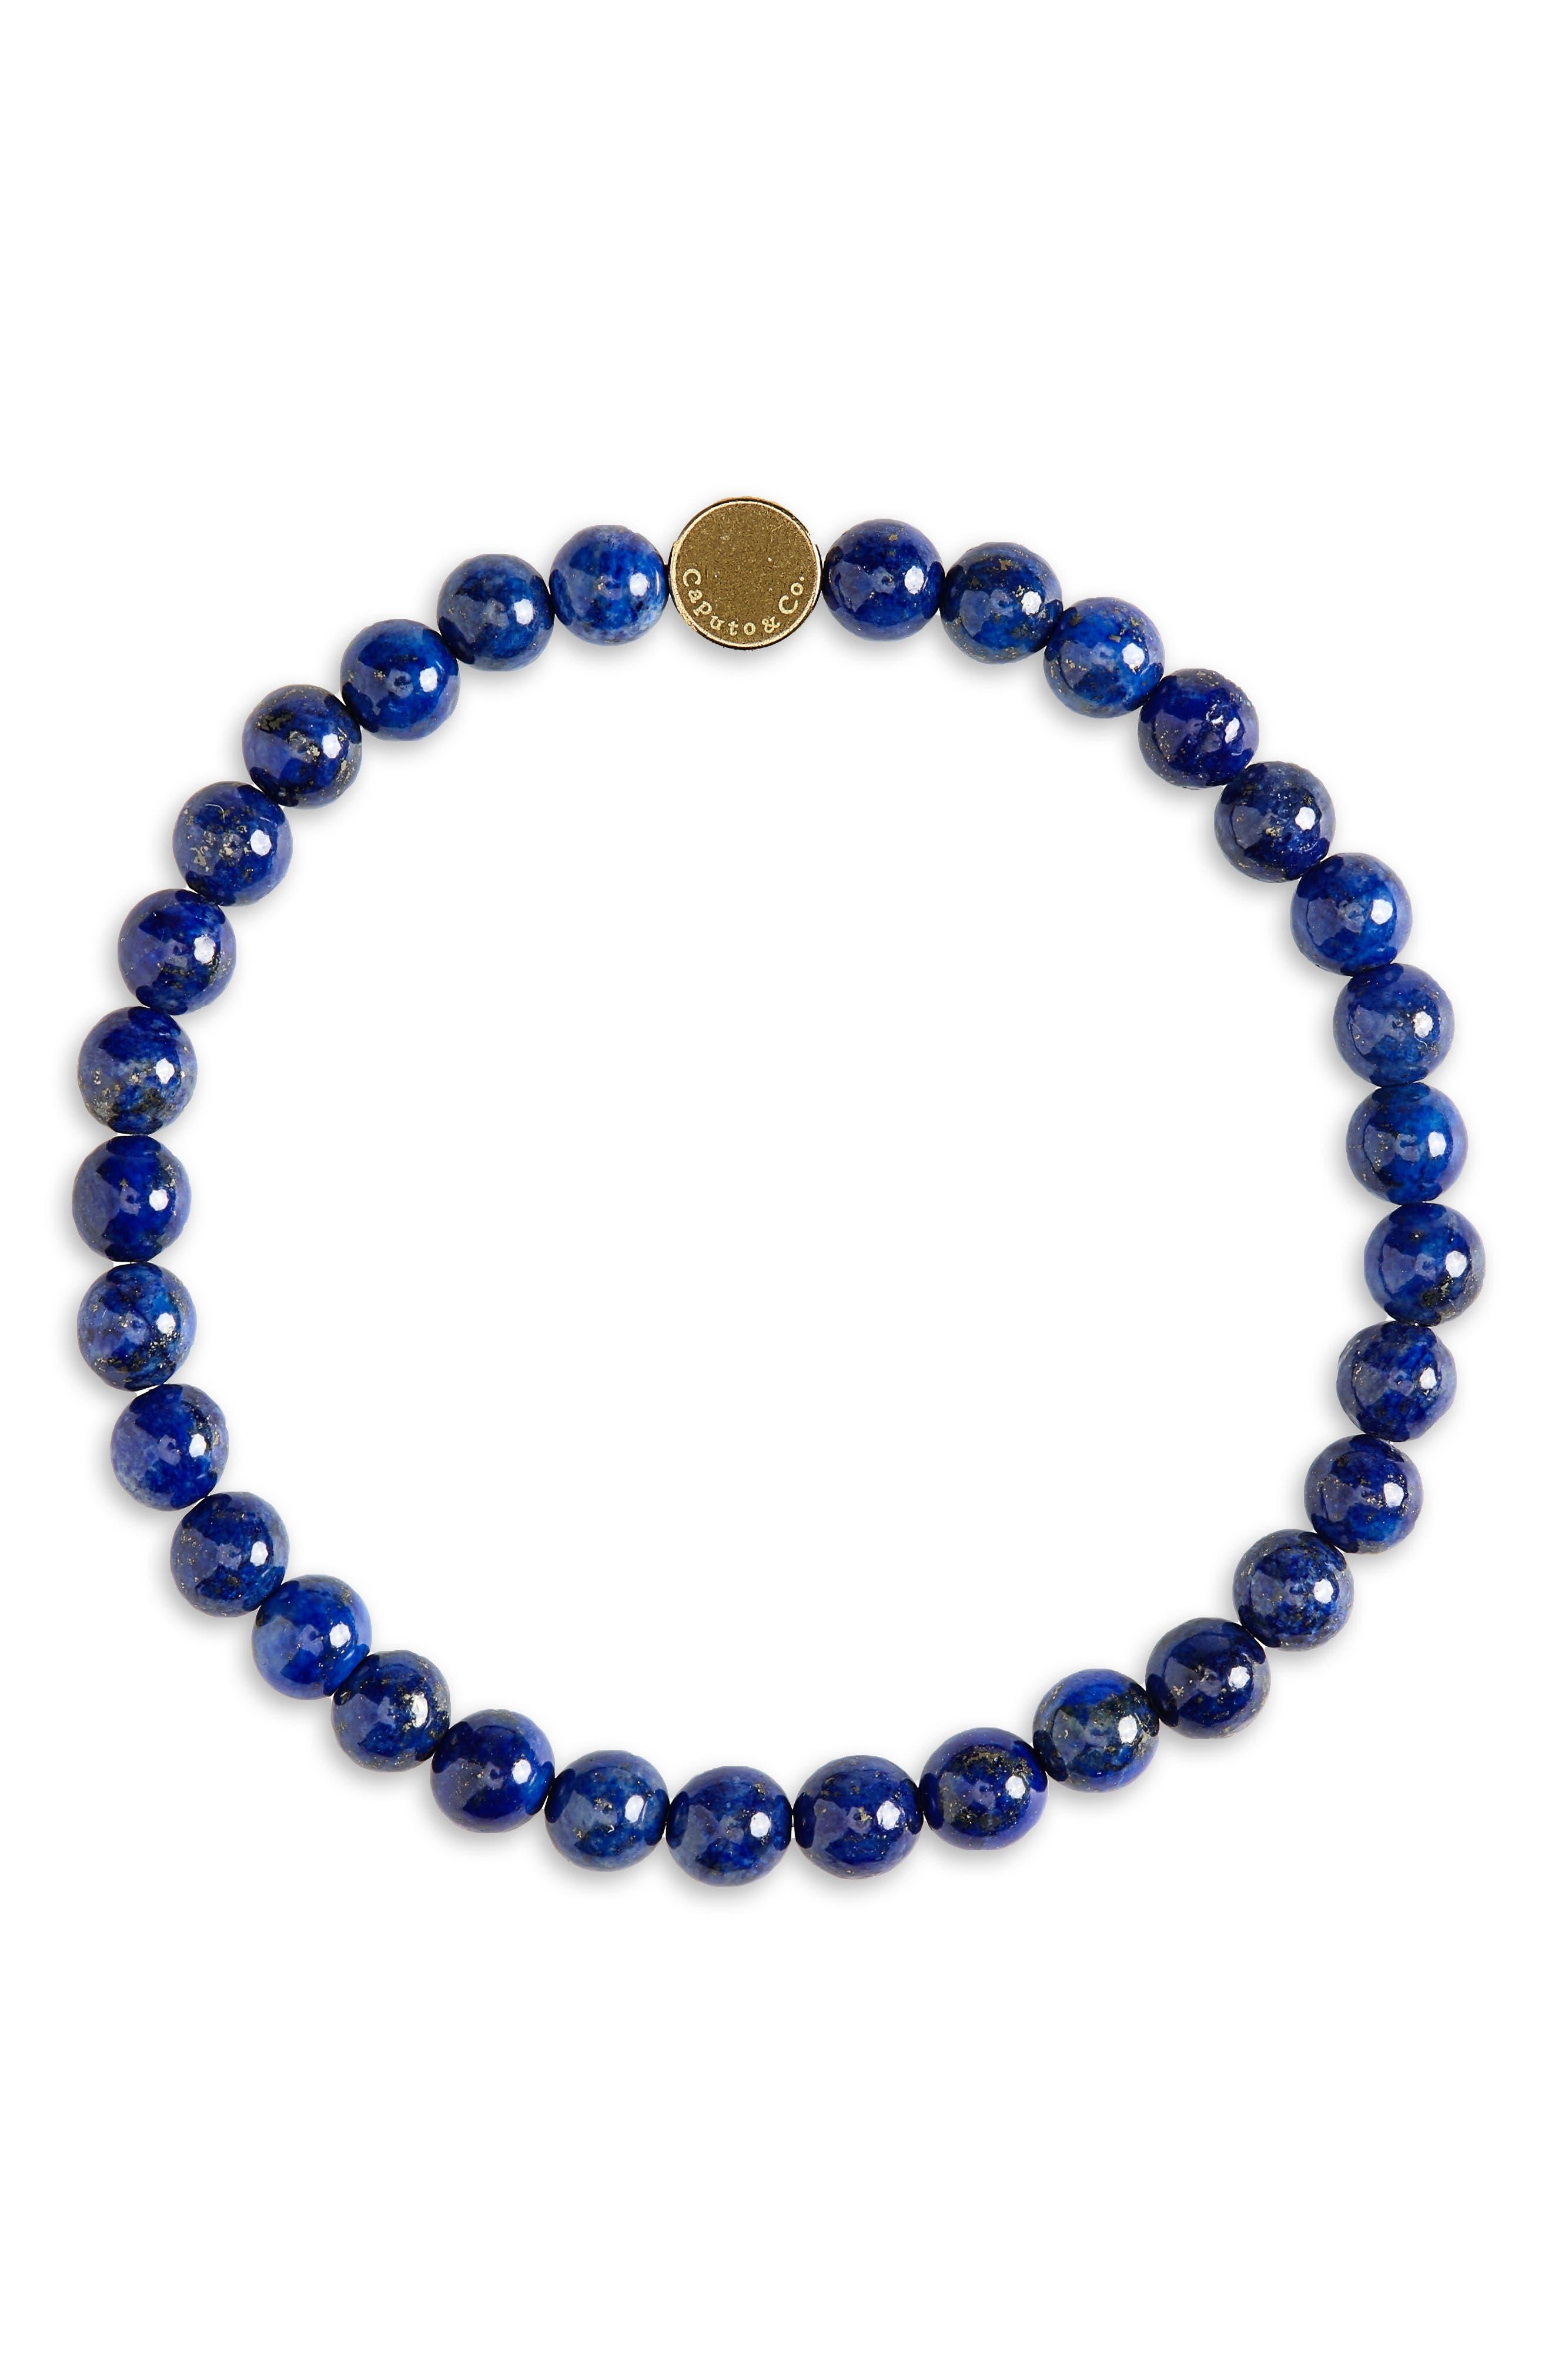 CAPUTO & CO. Stone Bead Bracelet in Lapis Lazuli